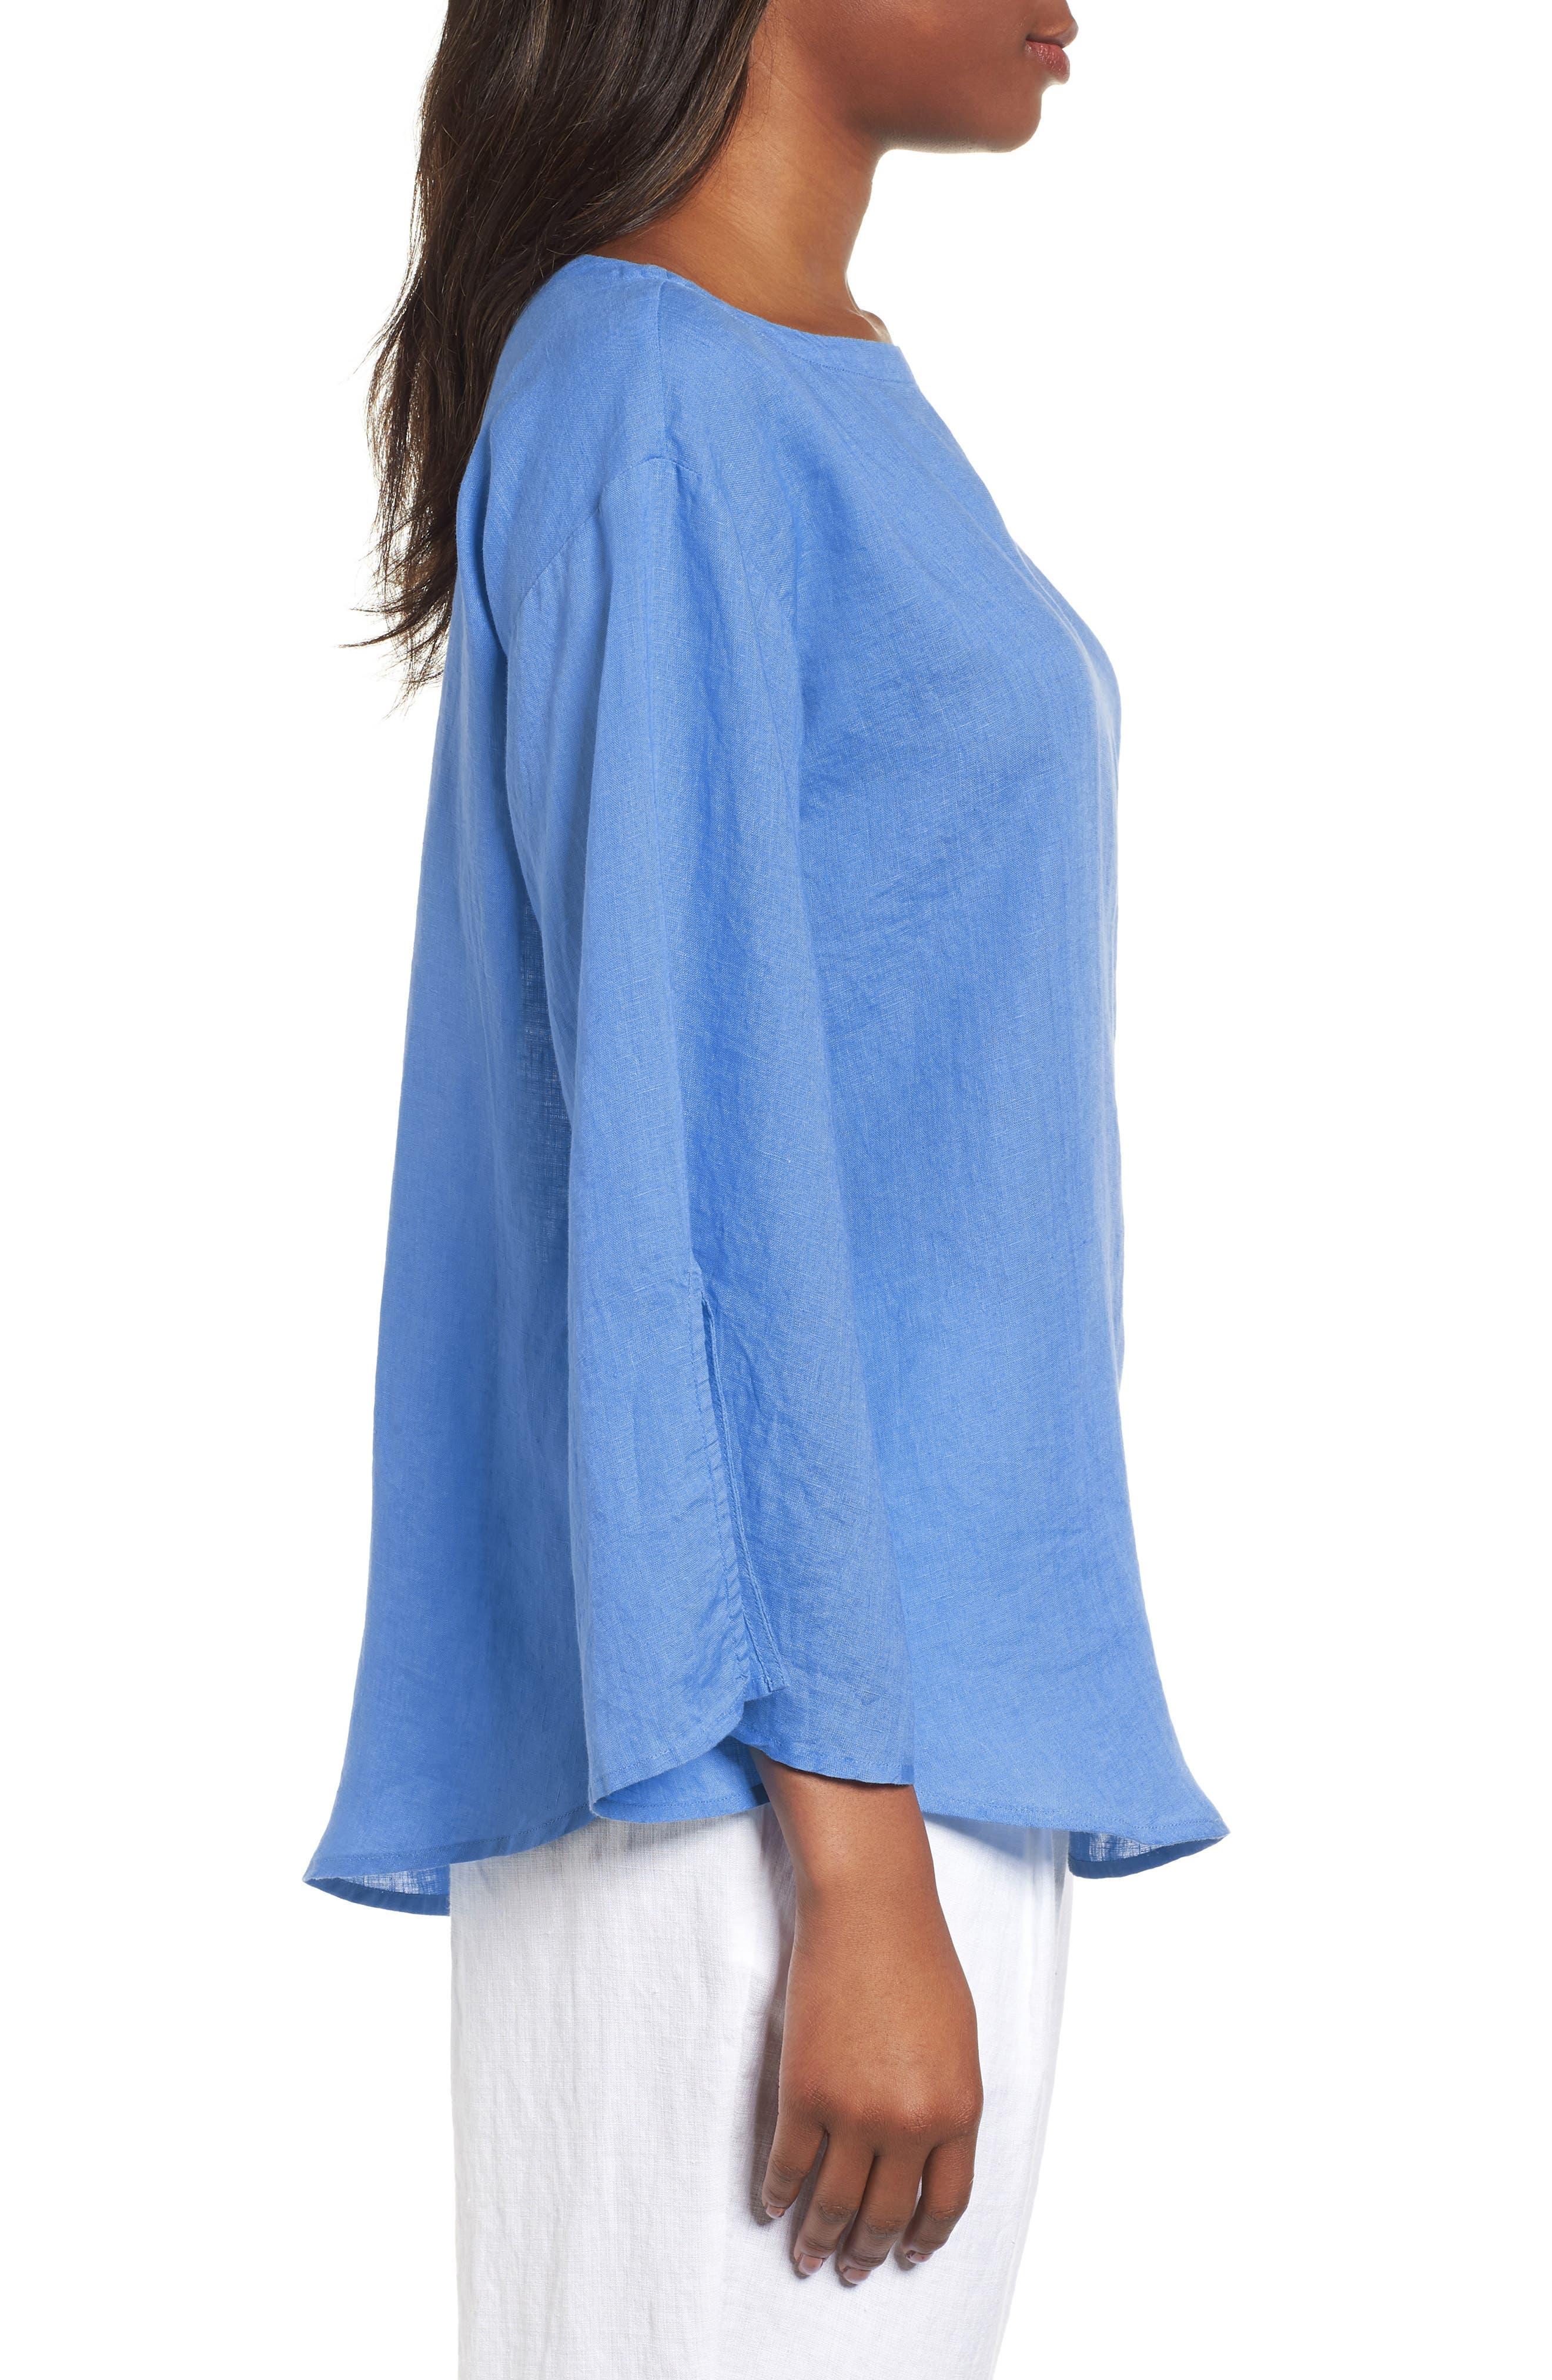 Woven Organic Linen Top,                             Alternate thumbnail 3, color,                             Bluebell